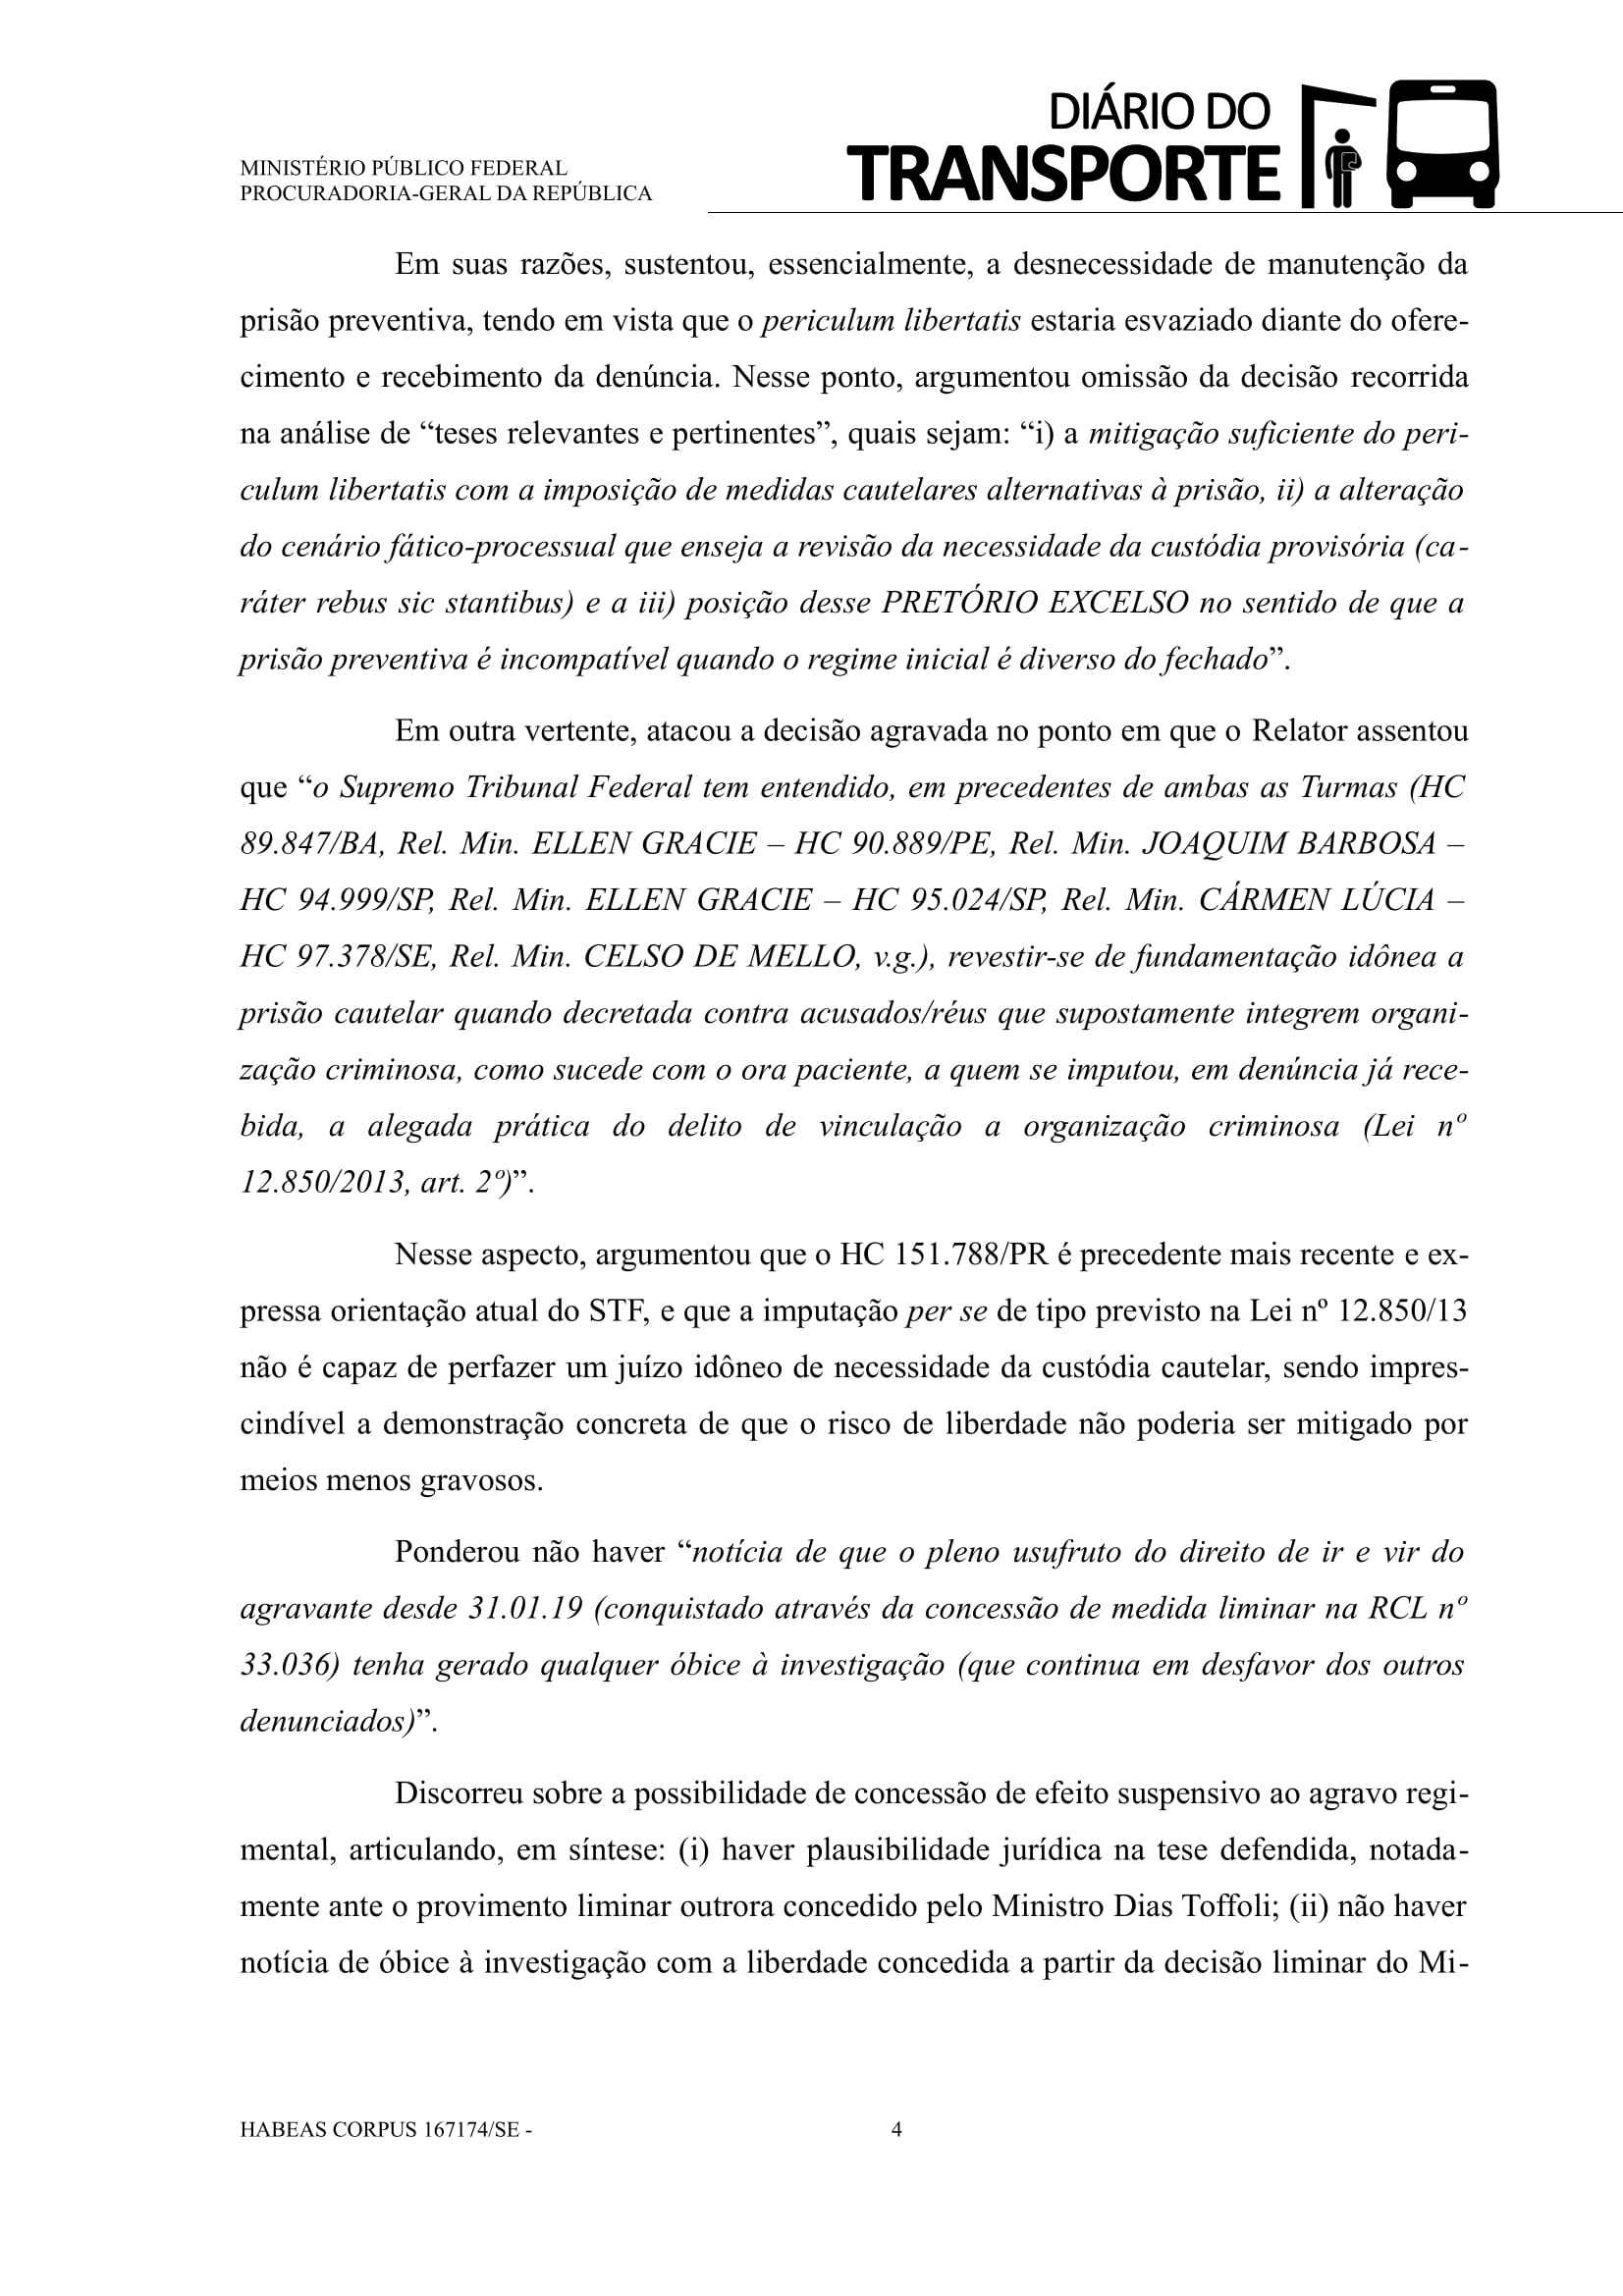 HC 167174_ContrarrazoesAgravo_Jose Valdevan de Jesus Santos-04